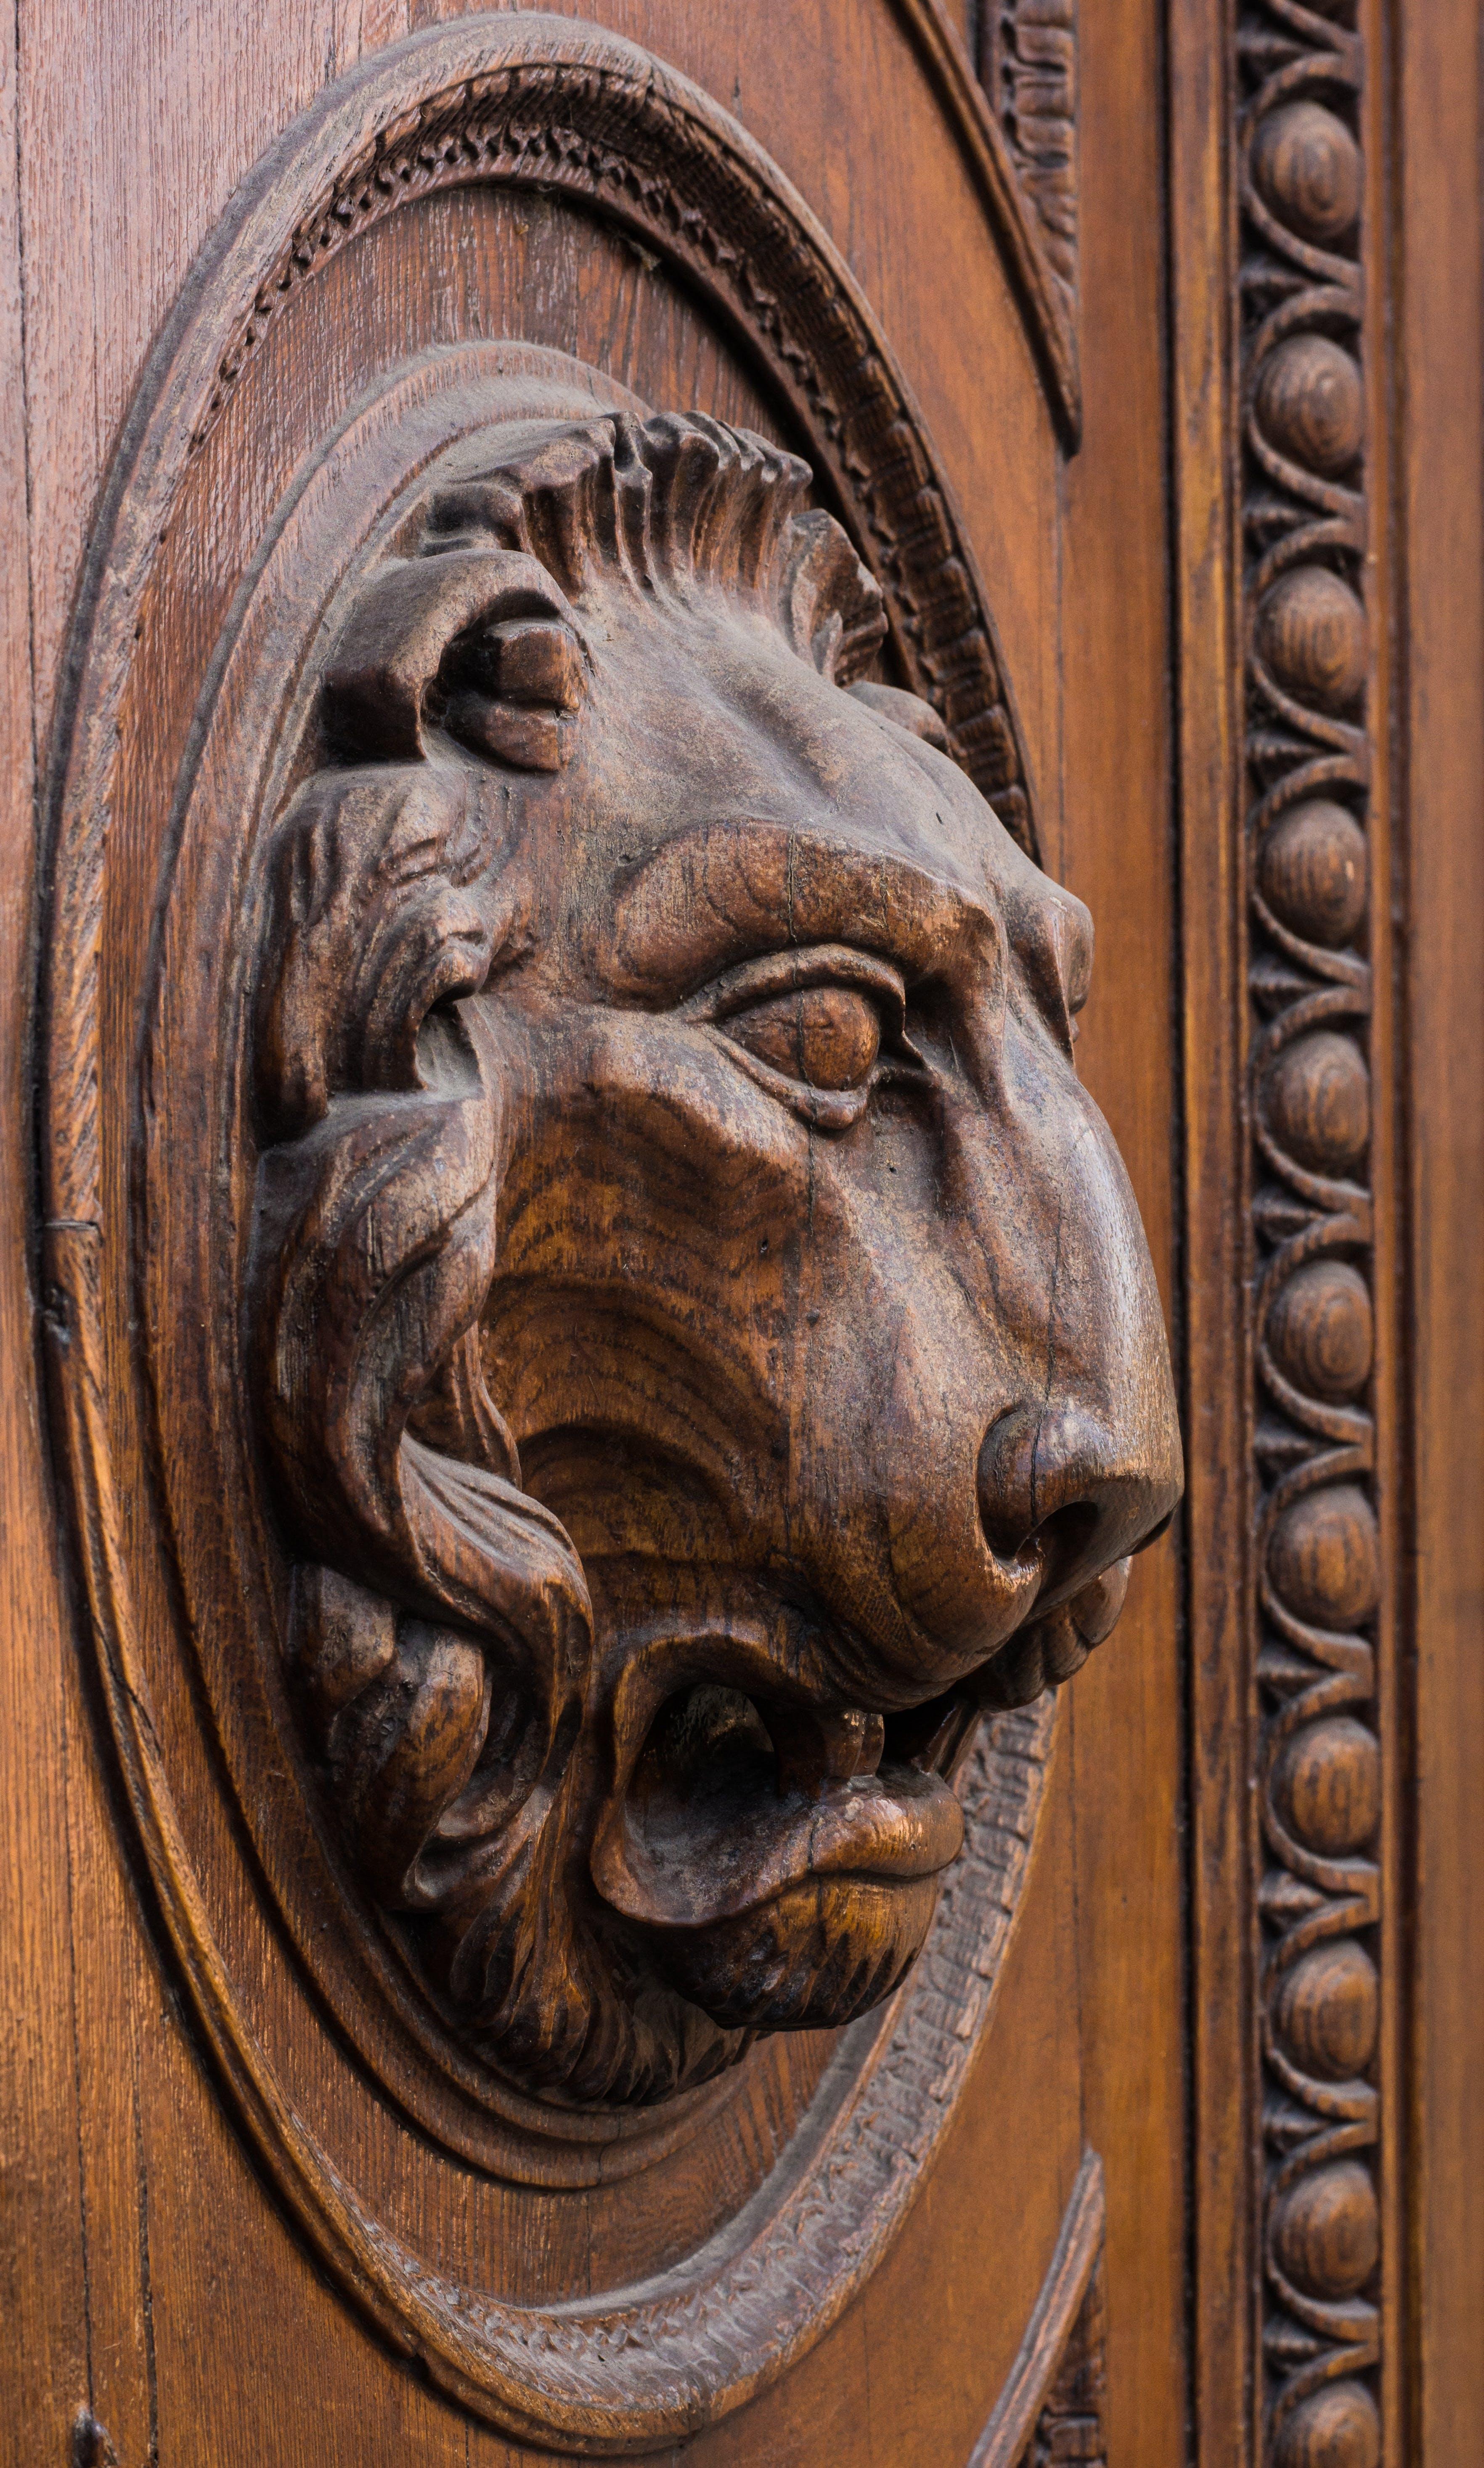 Free stock photo of wood, architecture, door, head